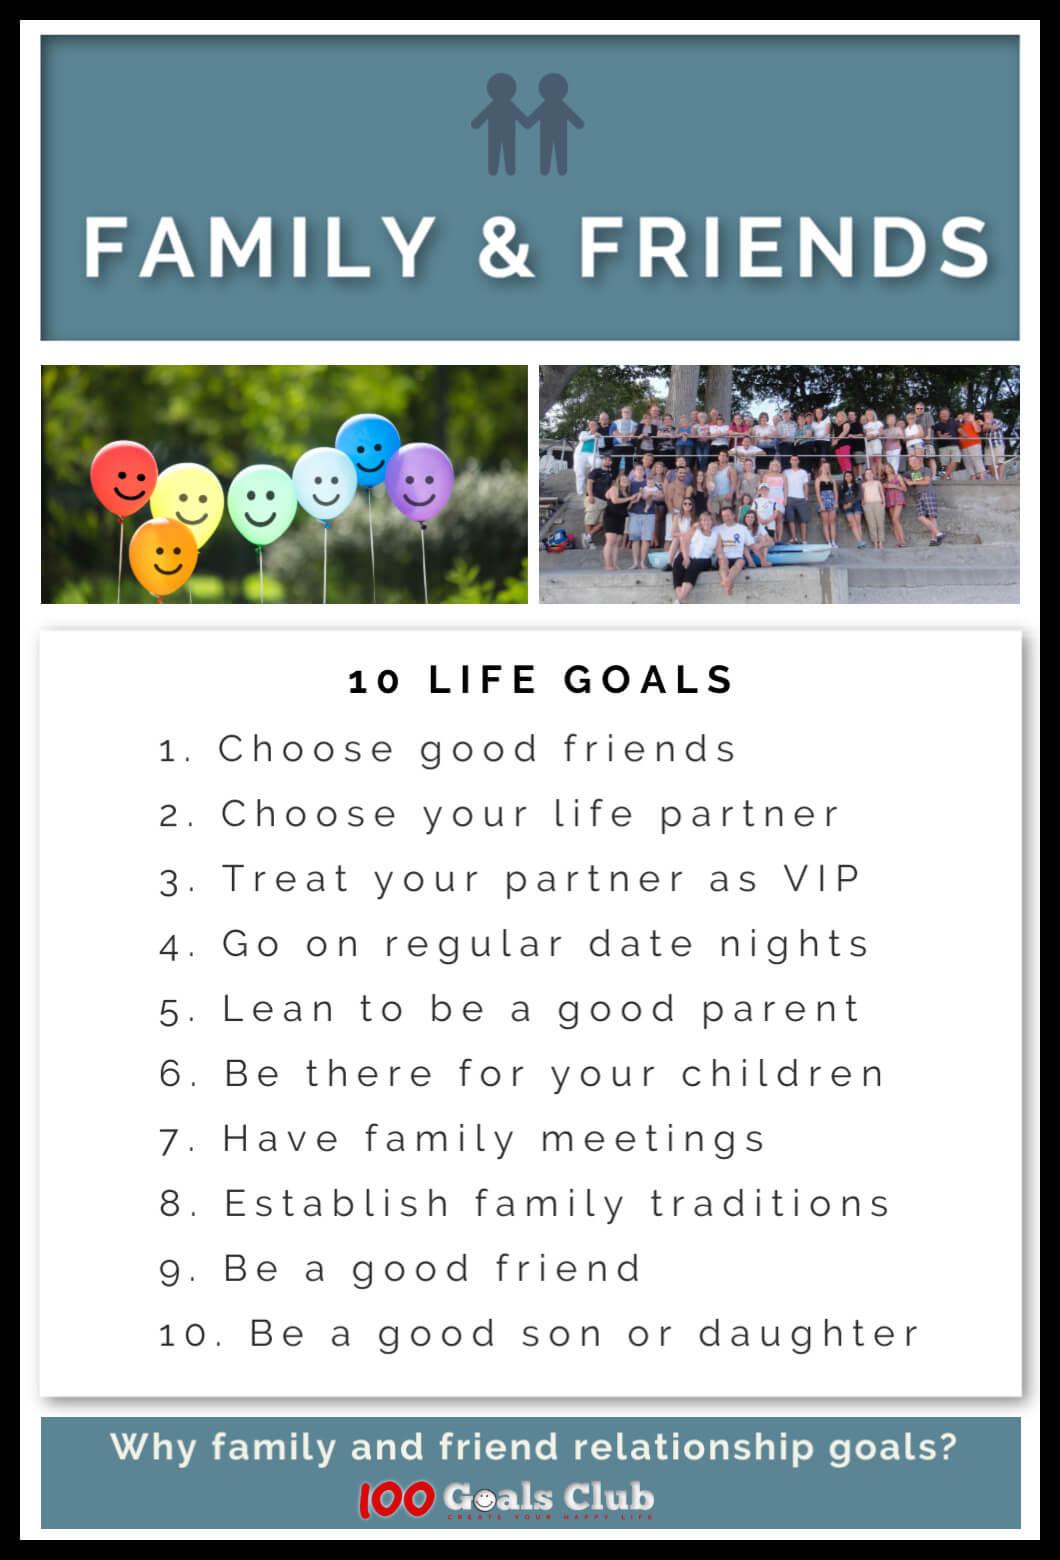 20 relationship goals for friends & family   200 Life Goals